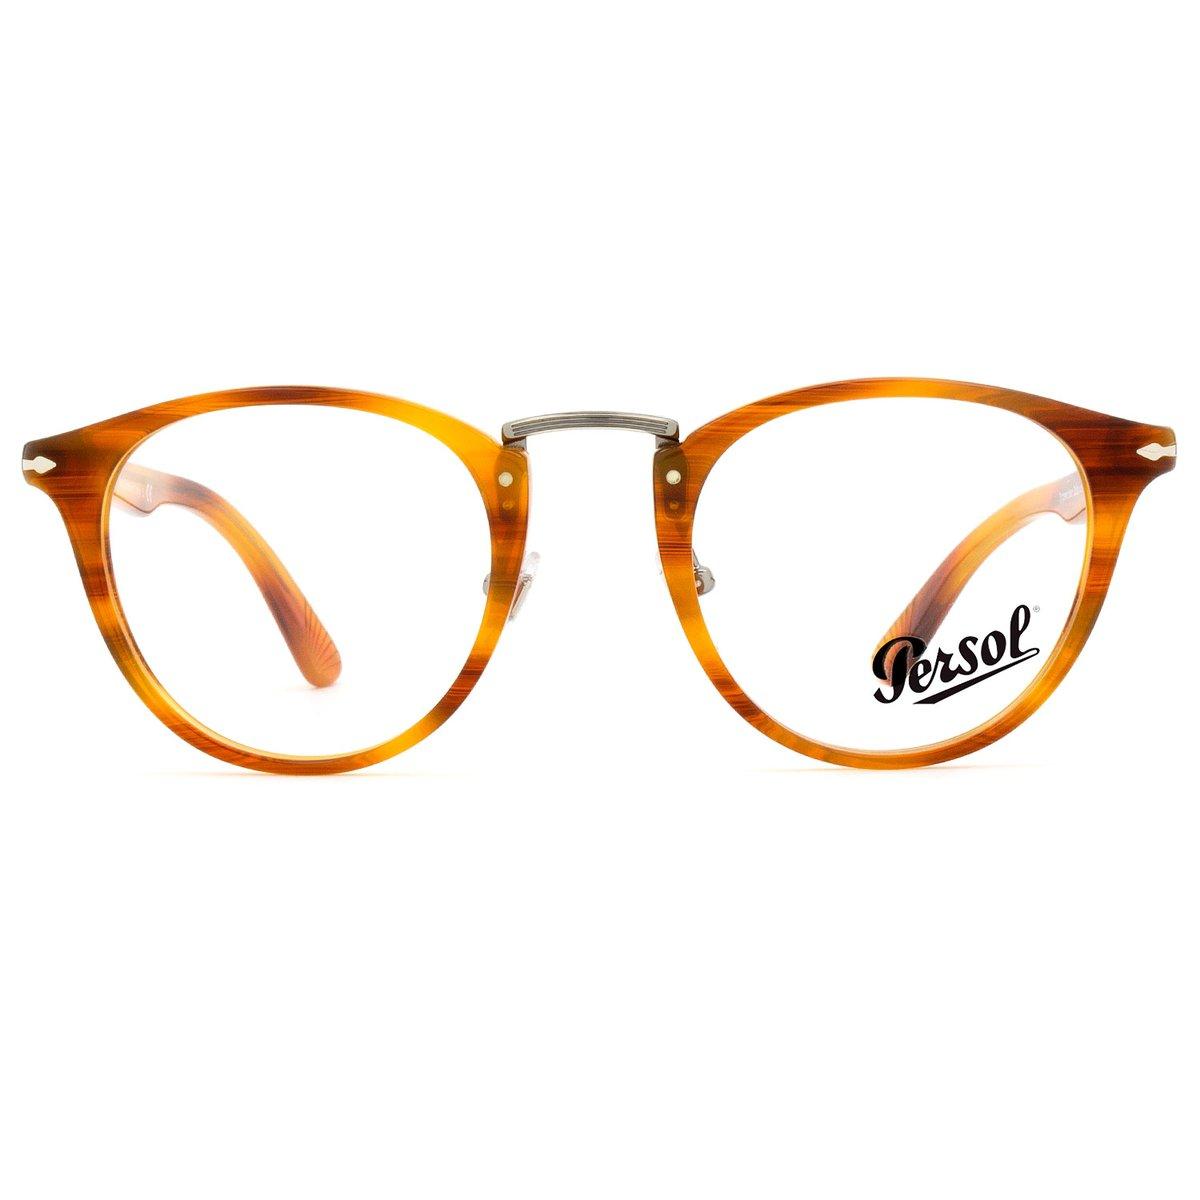 7d04107f7 Armação Óculos de Grau Persol Typewriter PO3107V 960-49 | Zattini